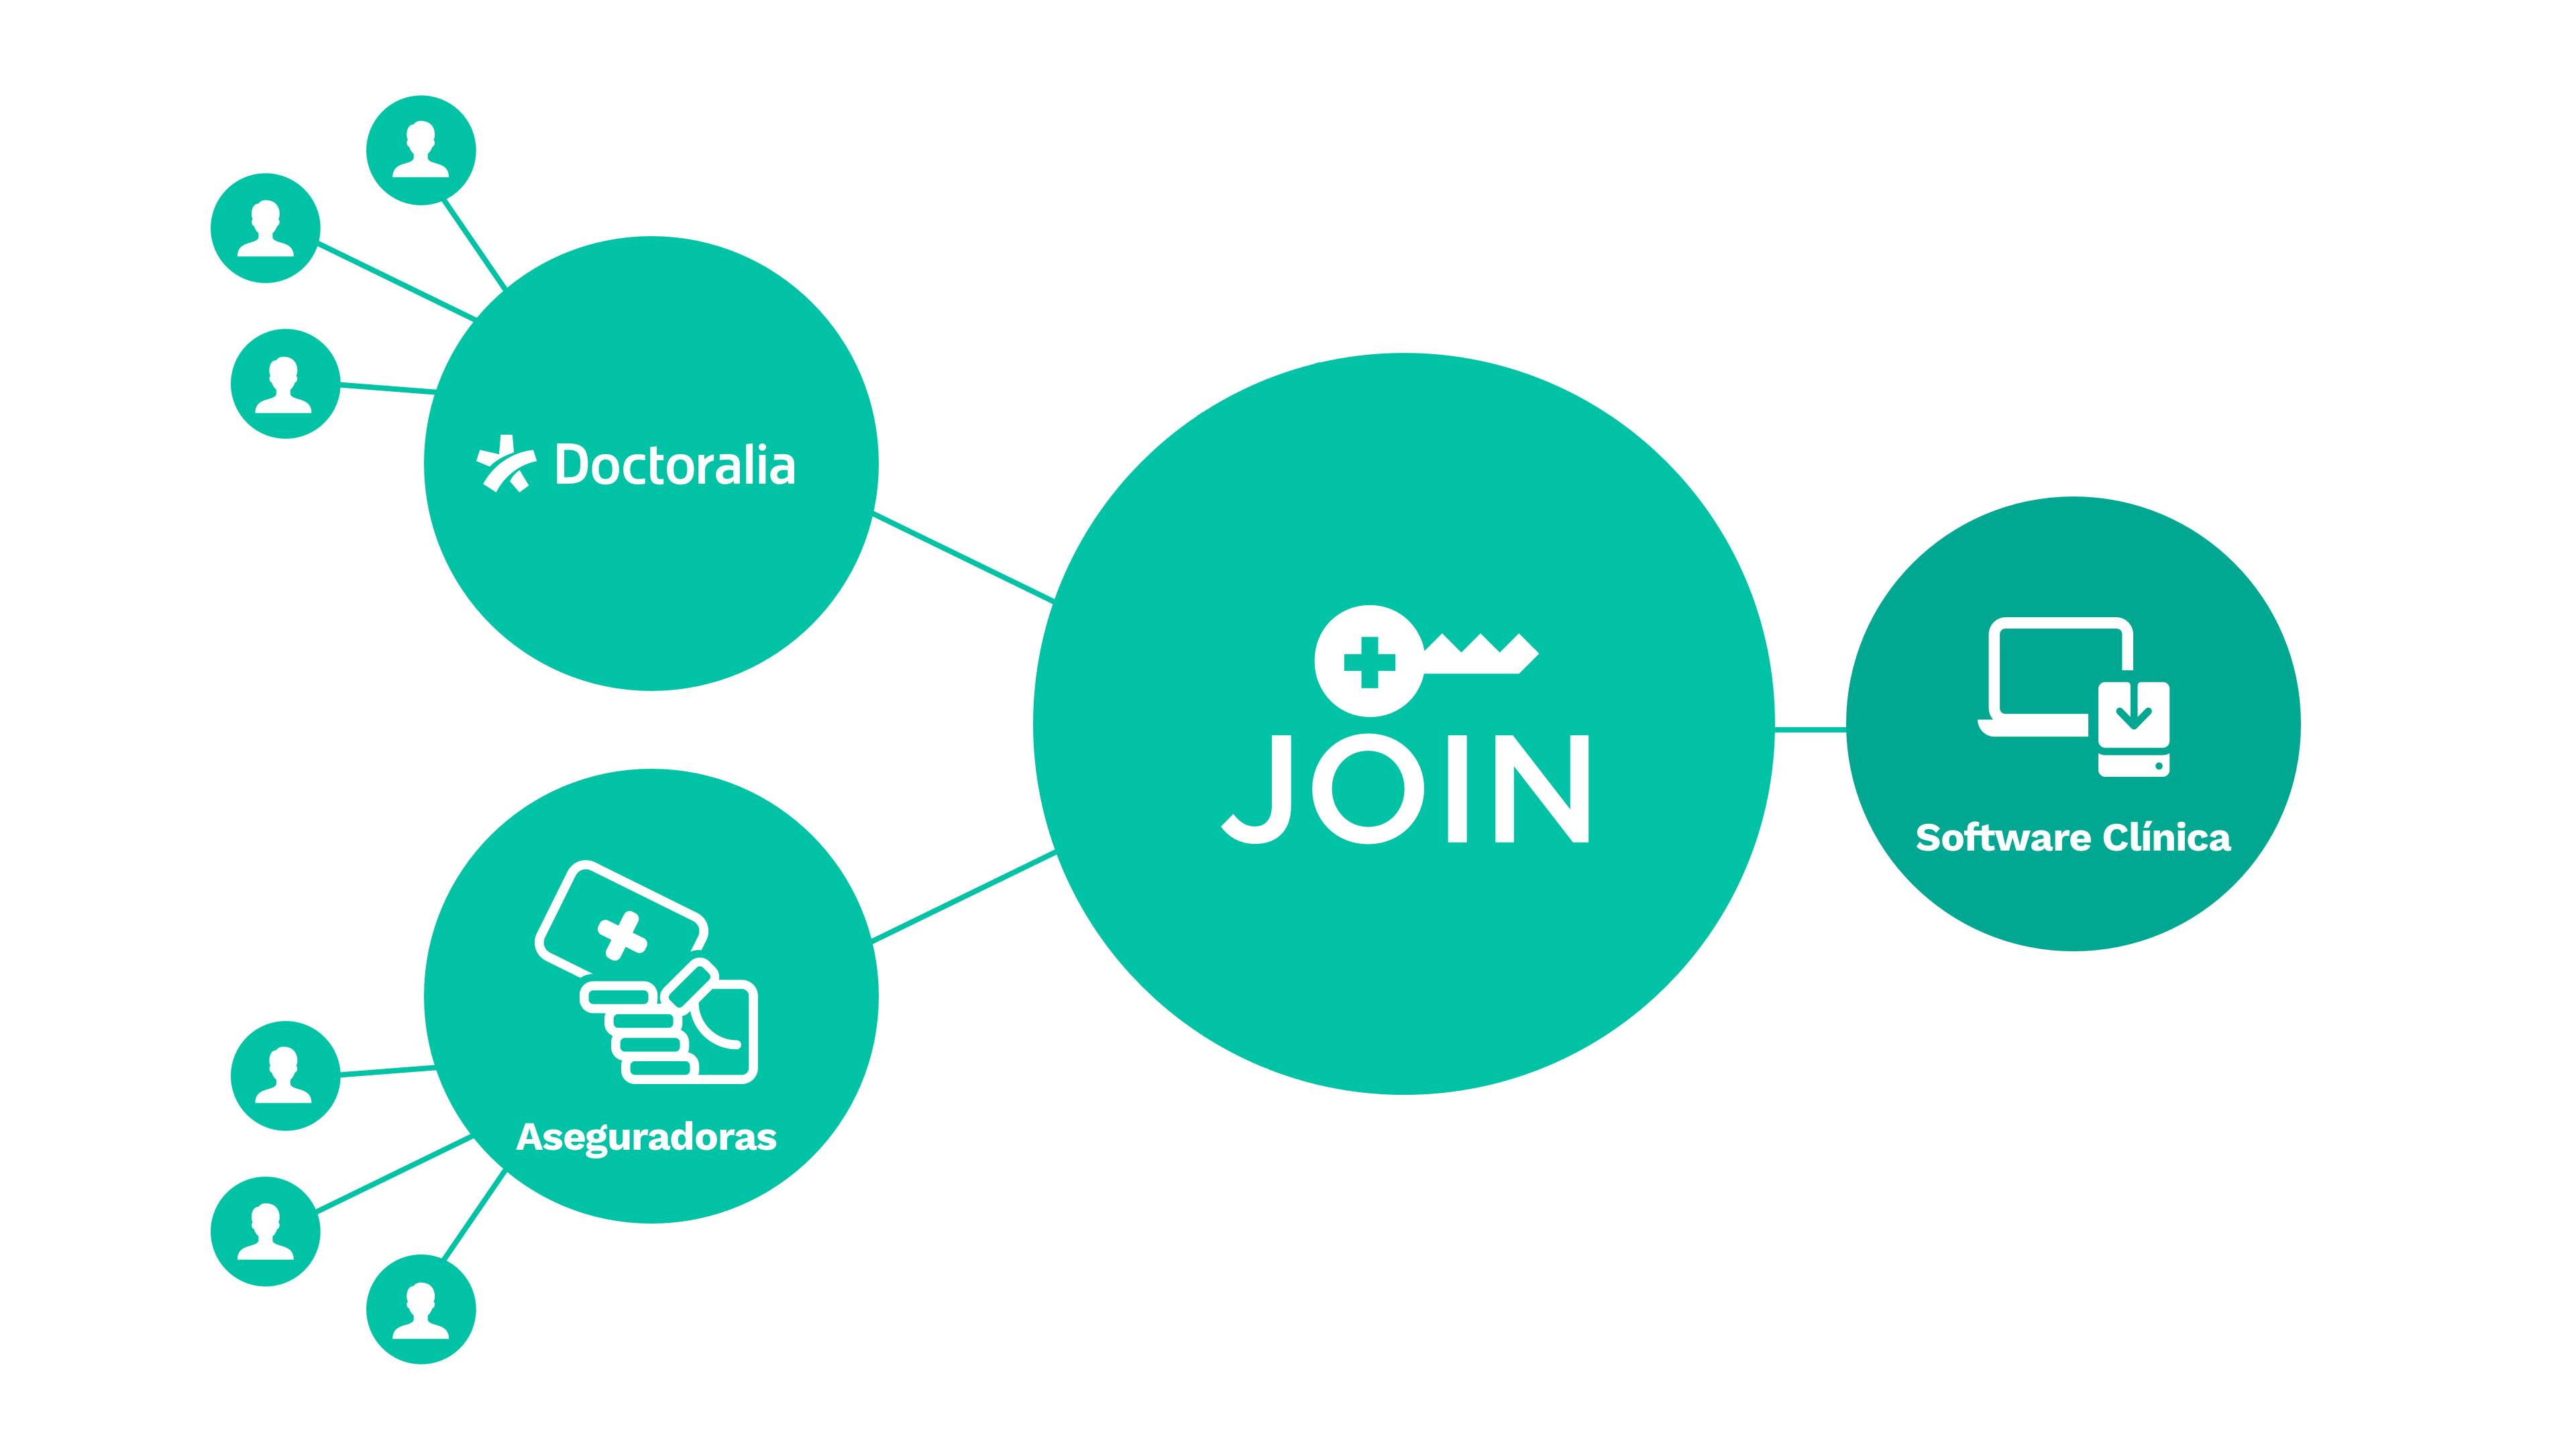 es-infographic-doctoralia-join